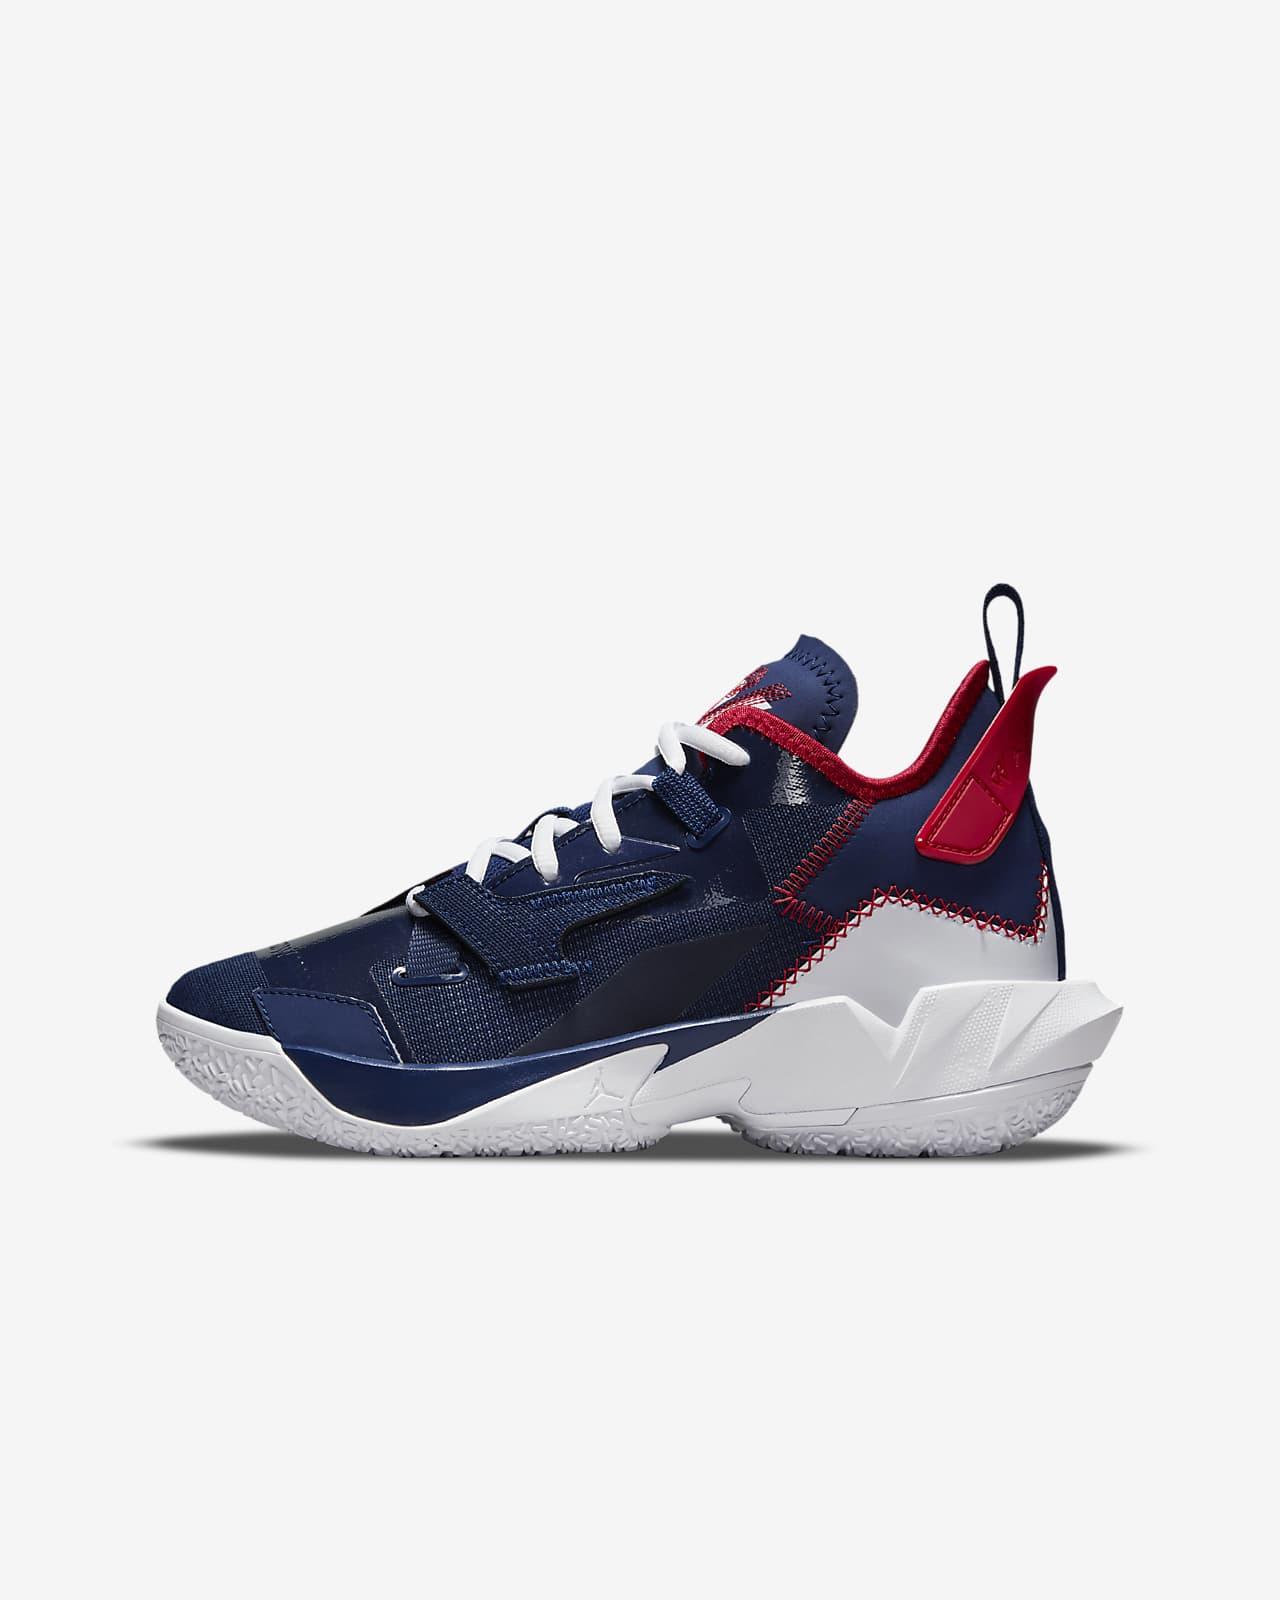 Jordan 'Why Not?' Zer0.4 Older Kids' Basketball Shoe